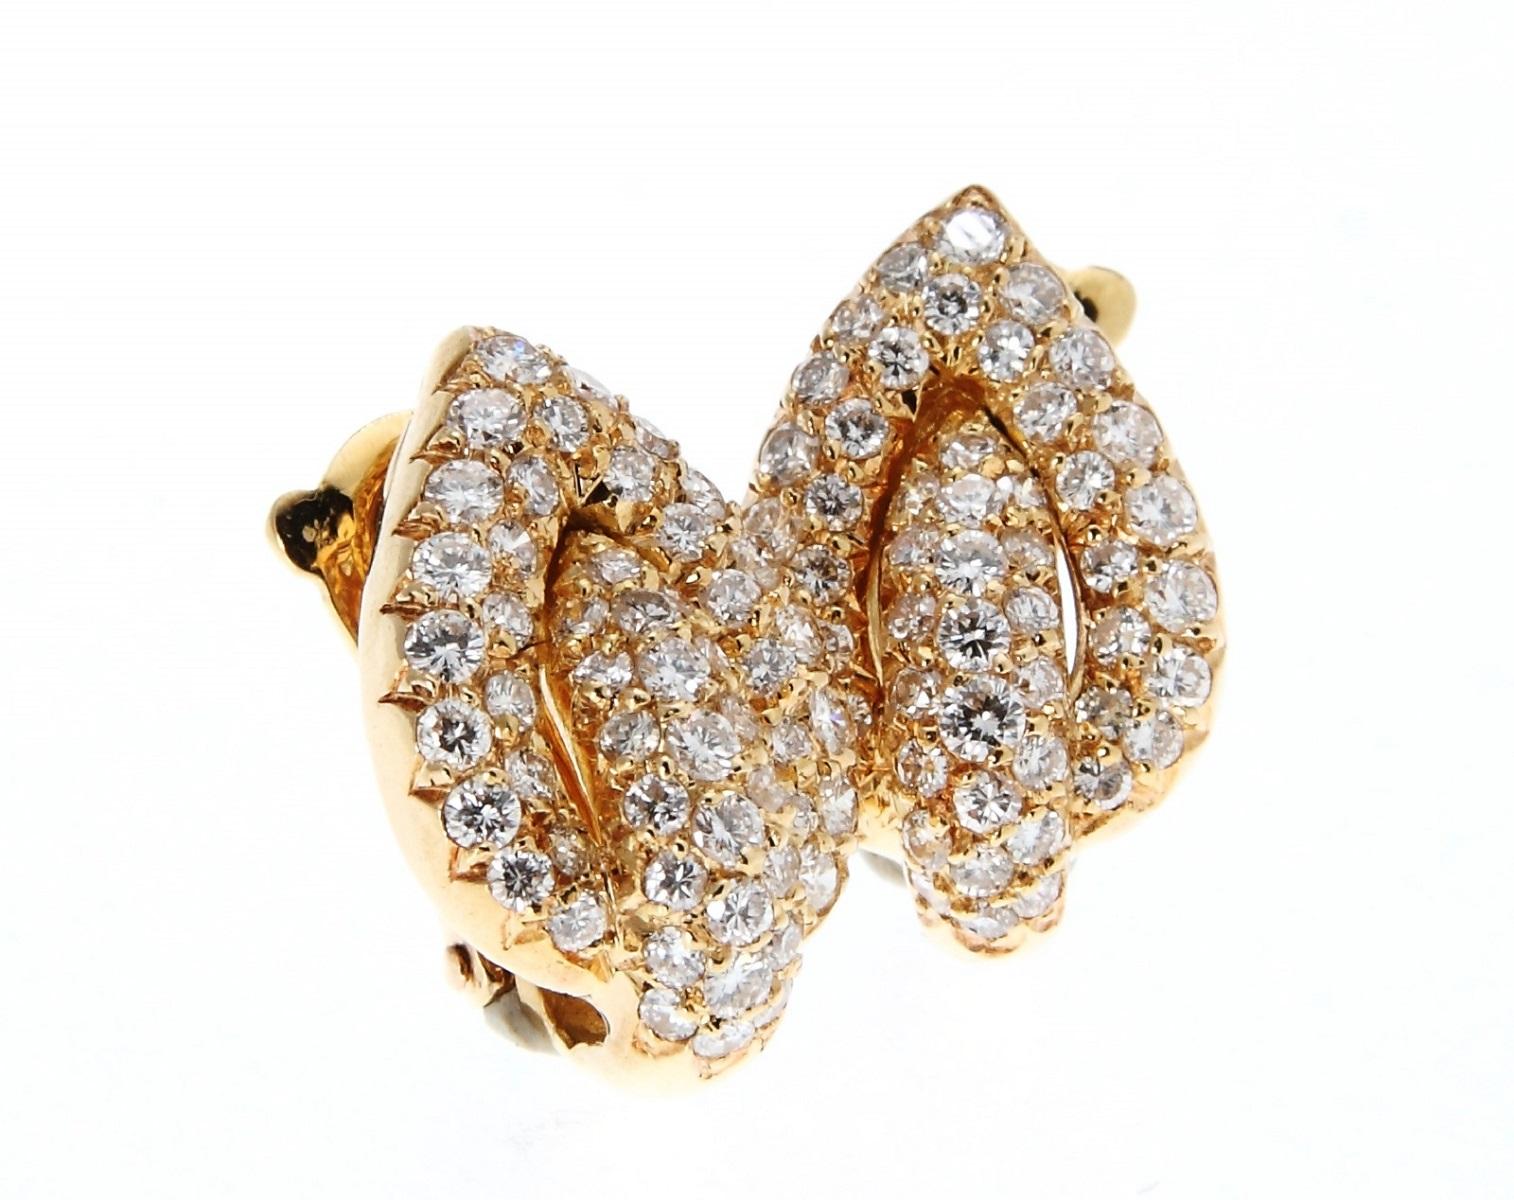 MAUBOUSSIN モーブッサン ダイヤモンド リング 指輪 K18YG イエローゴールド 送料無料 【トレジャースポット】【中古】